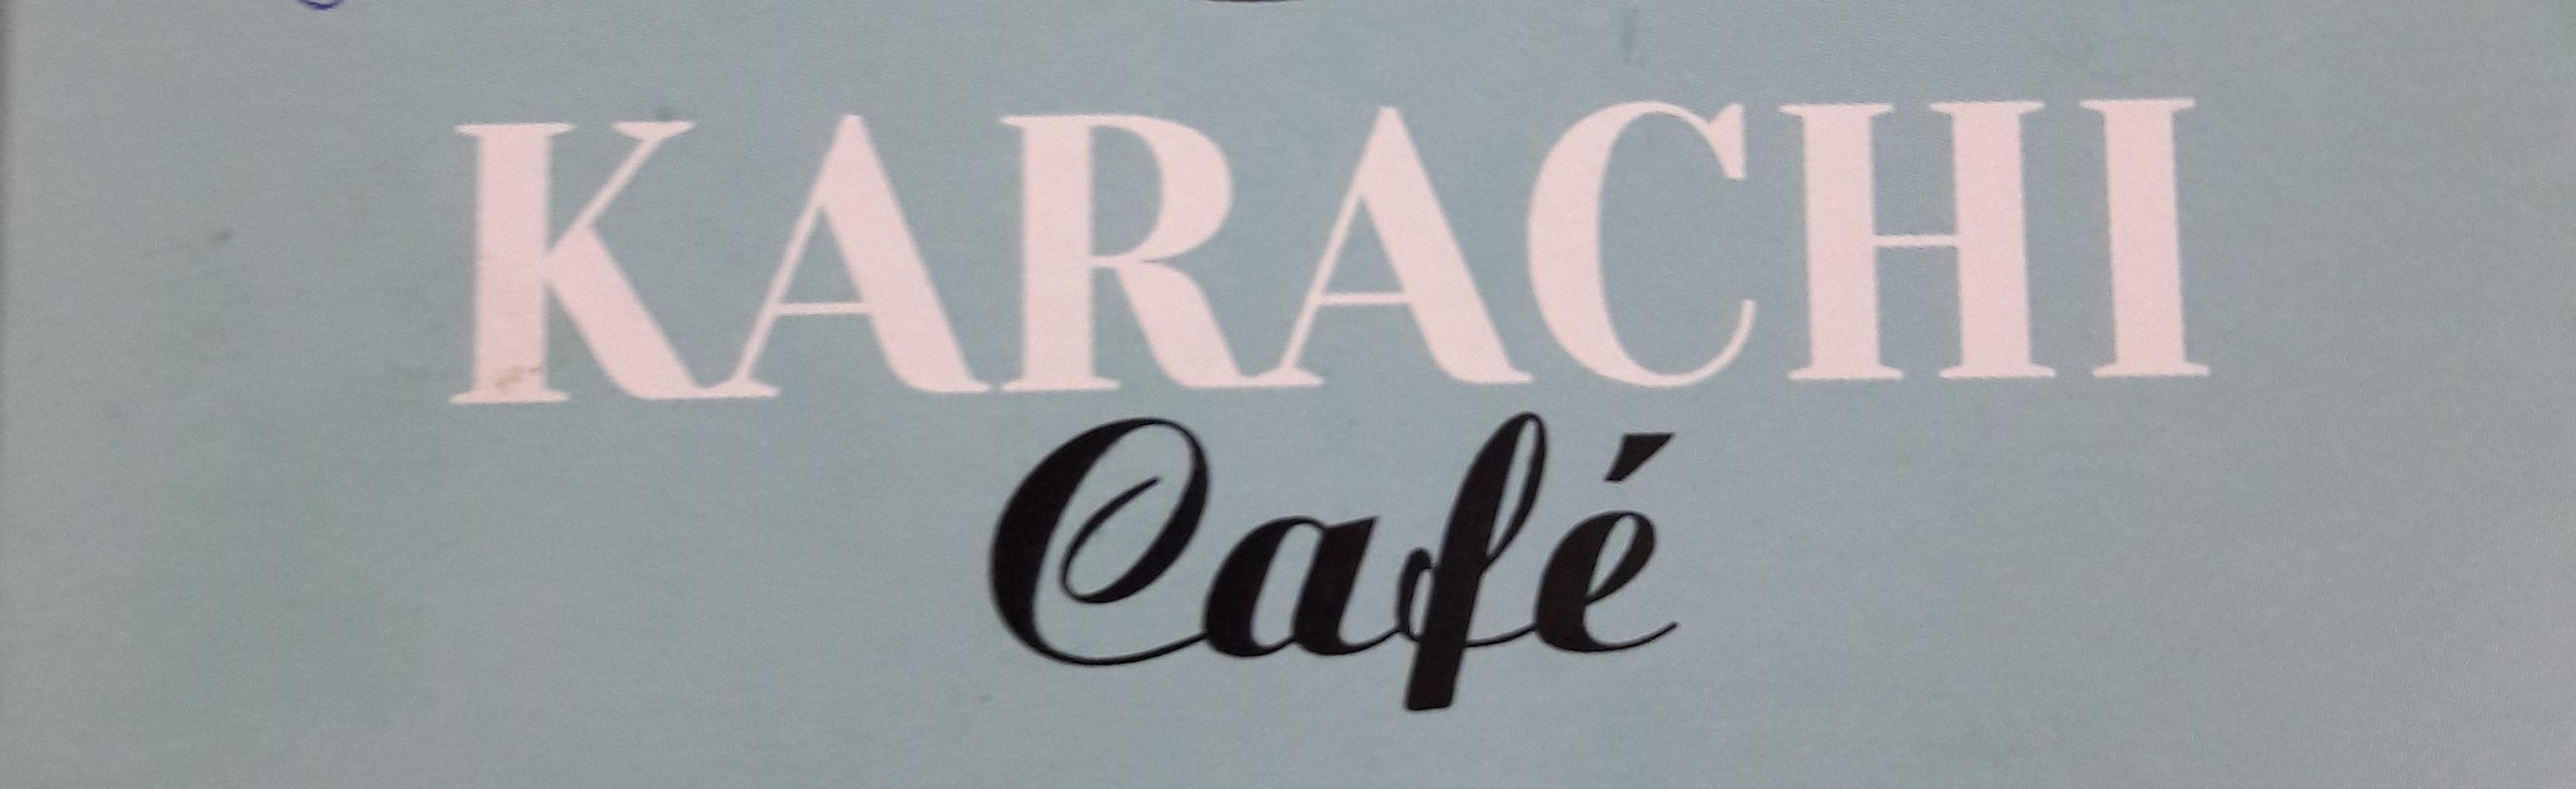 Karachi Cafe